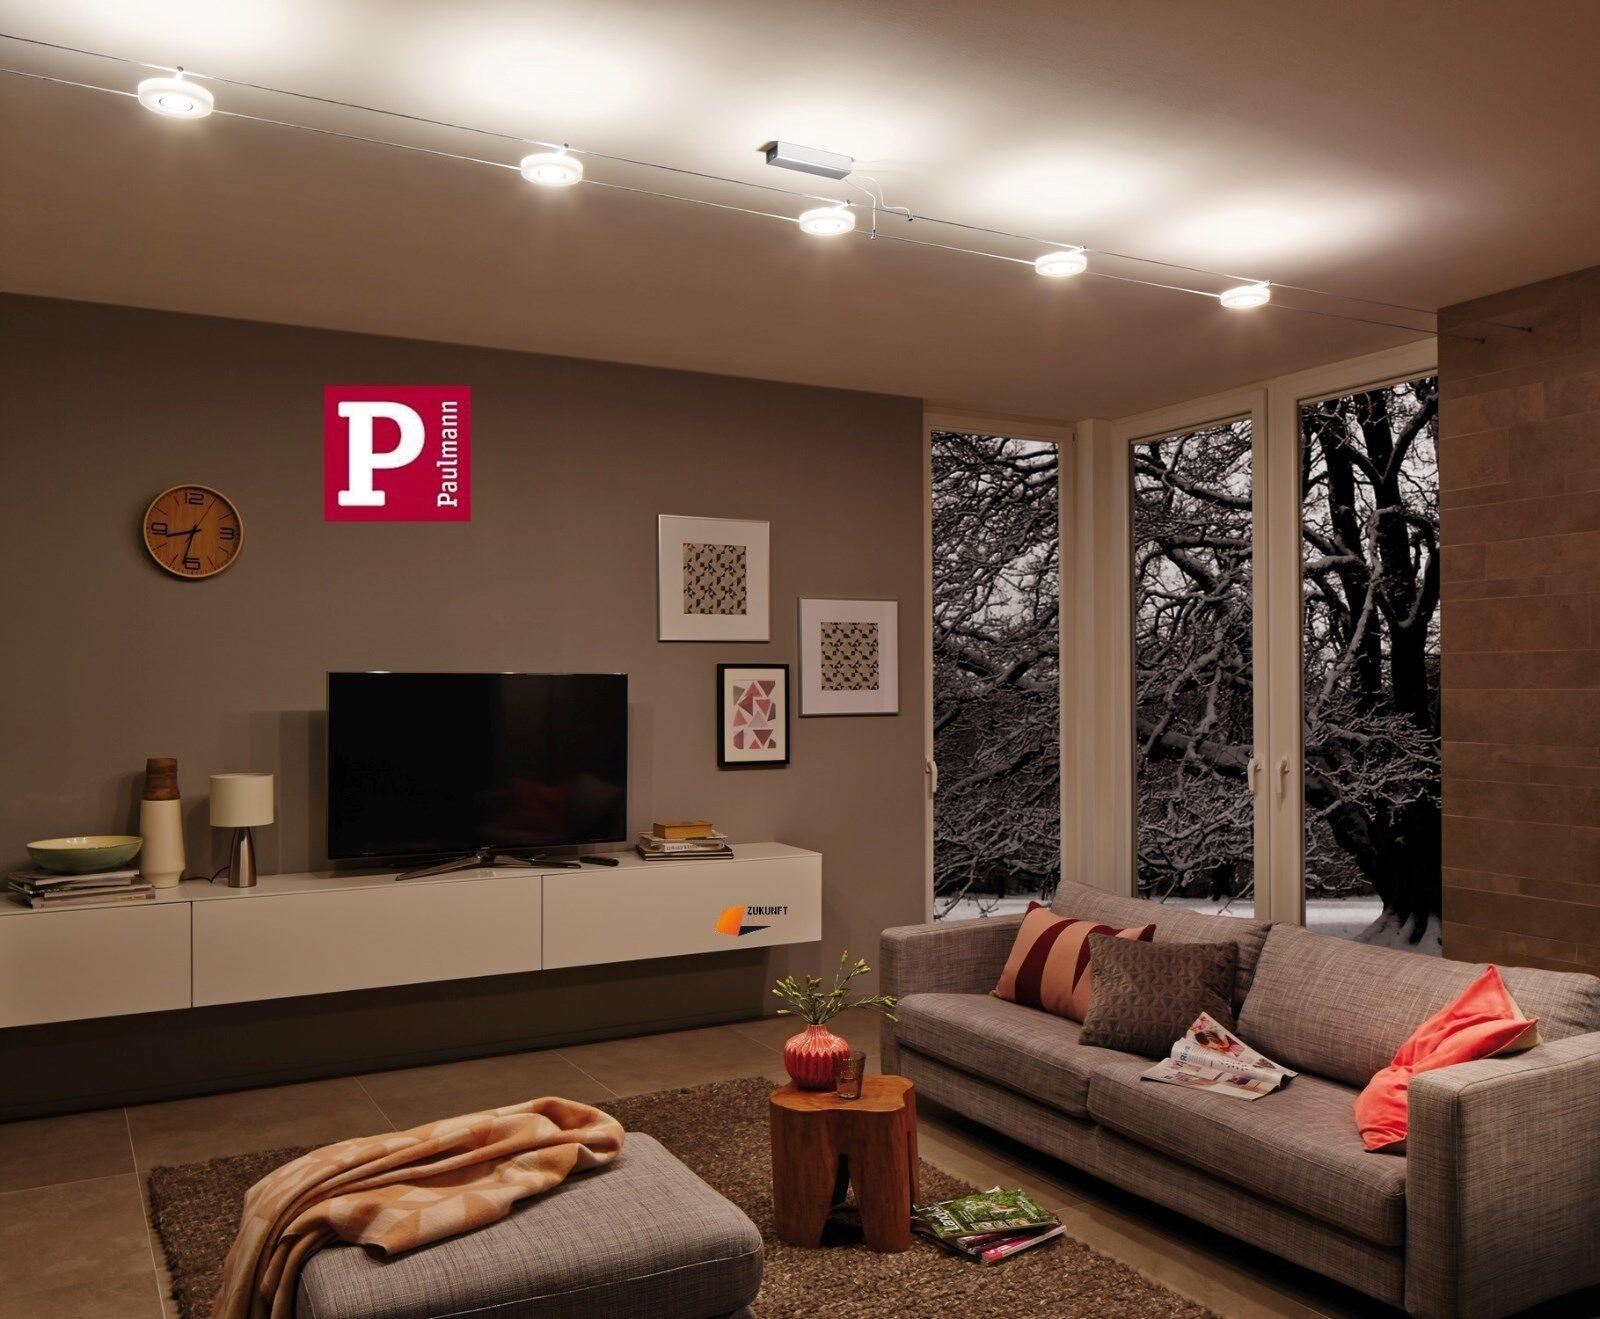 paulmann led seilsystem discled i 5x4w 12v neuste led technik art 94109 new eur 199 95. Black Bedroom Furniture Sets. Home Design Ideas